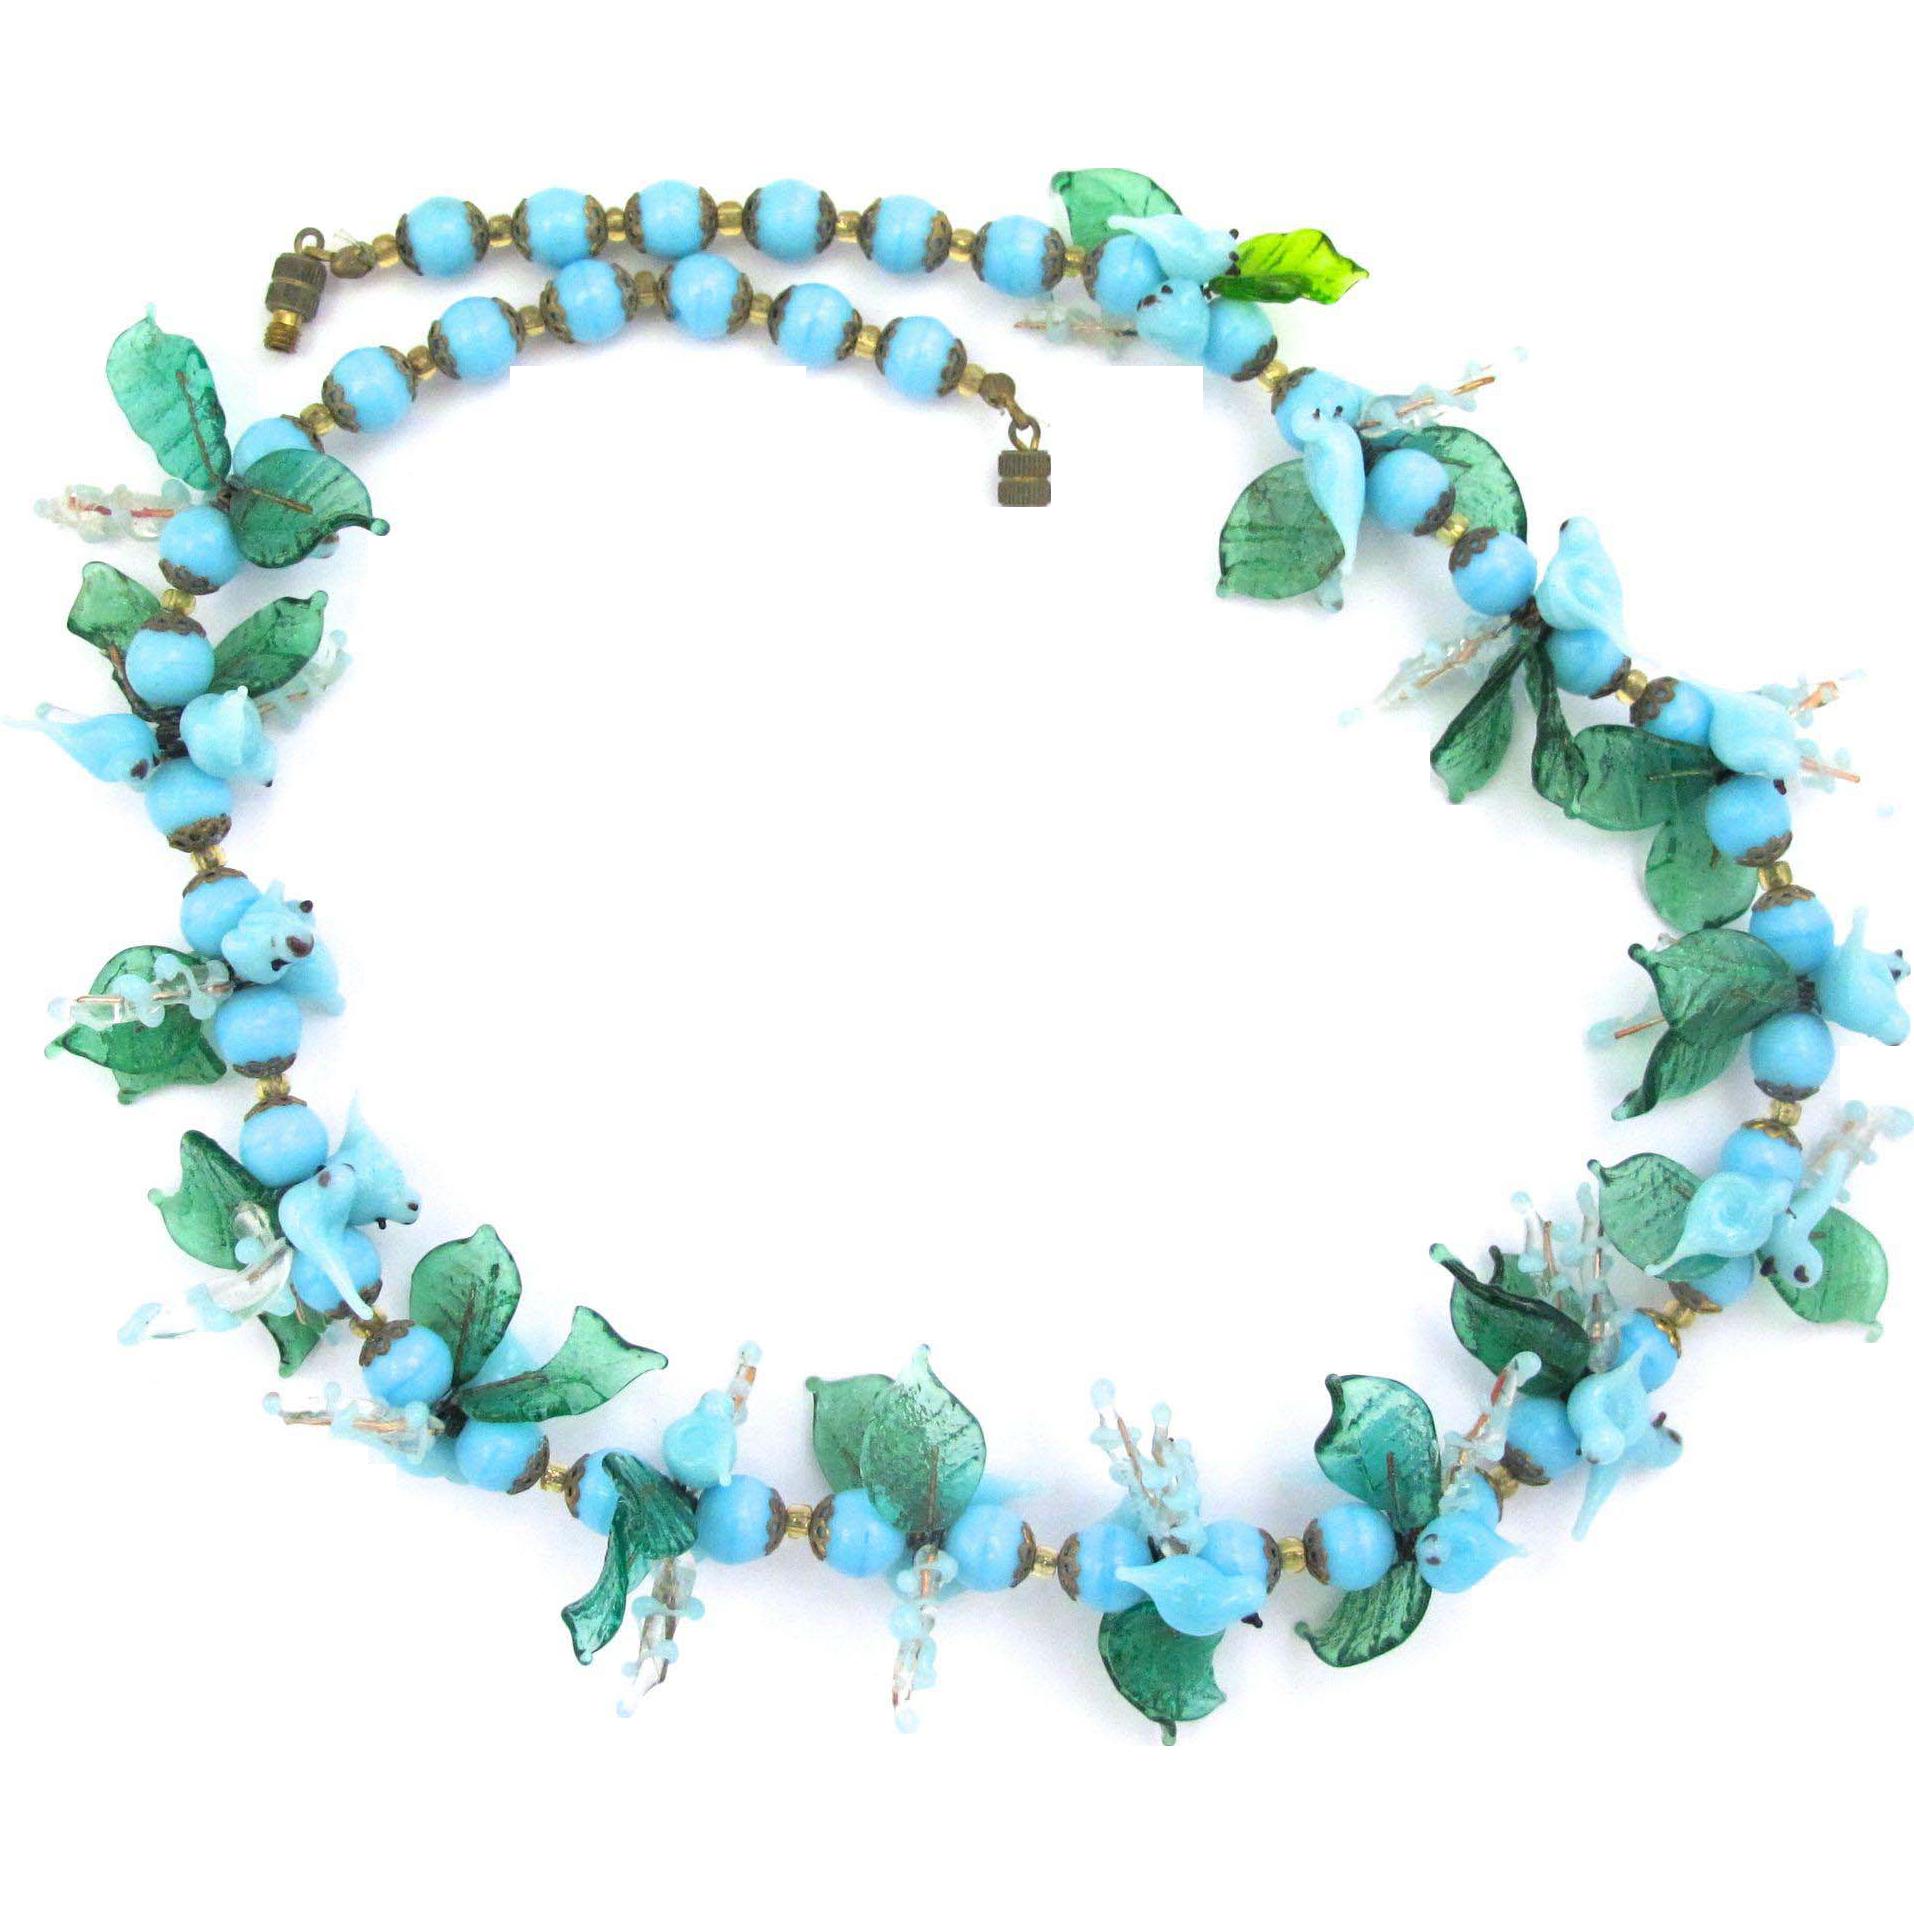 Venetian italy blue glass. Jewel clipart vintage jewelry